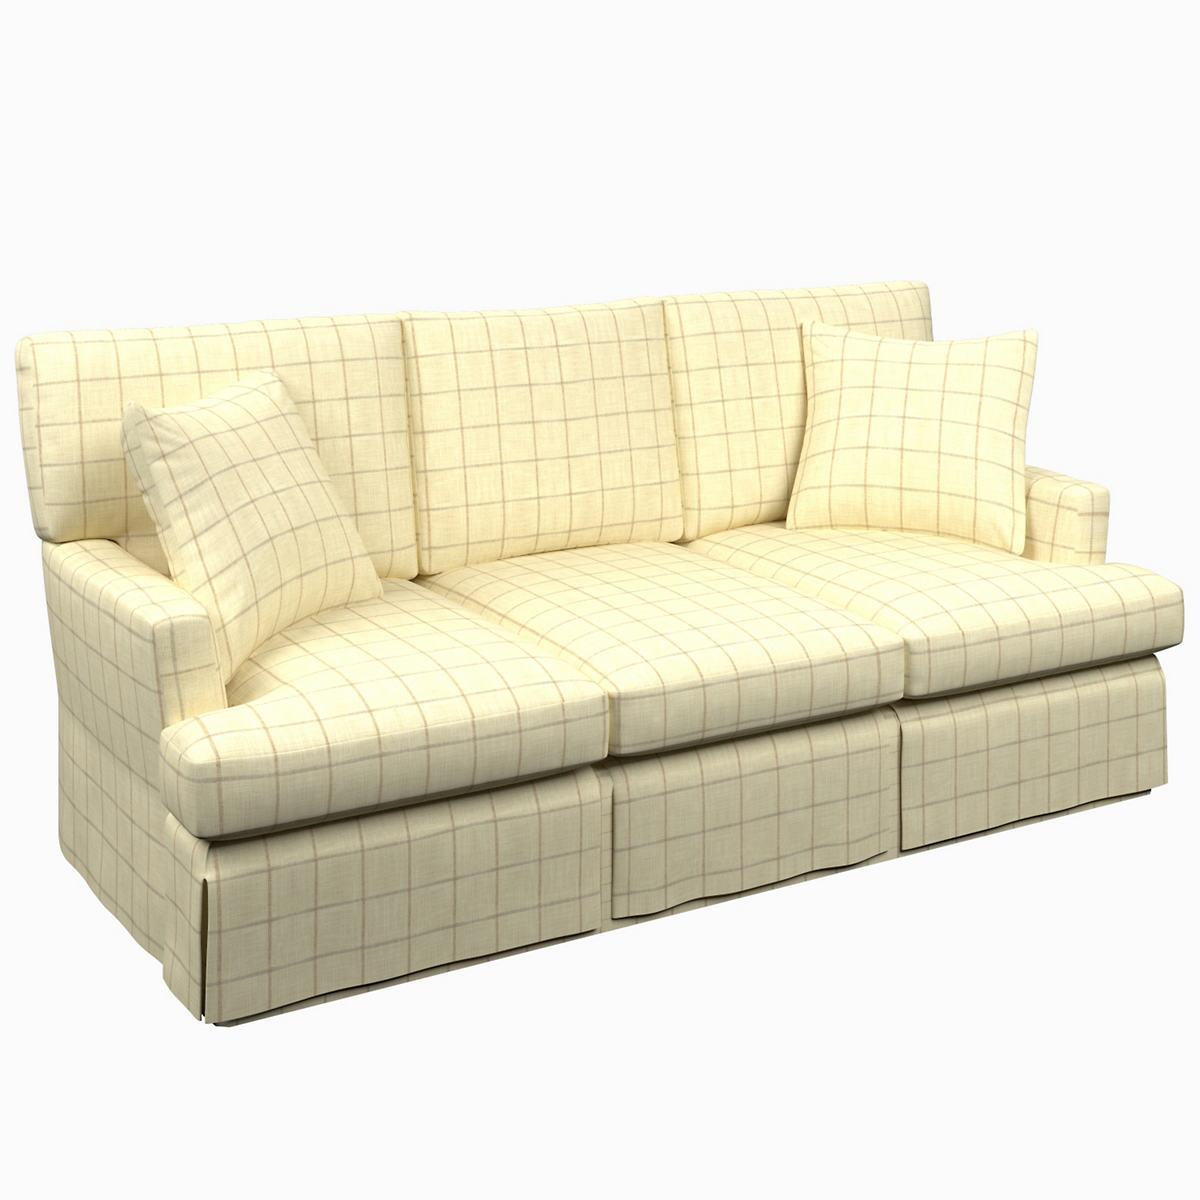 Chatham Tattersall Natural/Grey Saybrook 3 Seater Upholstered Sofa